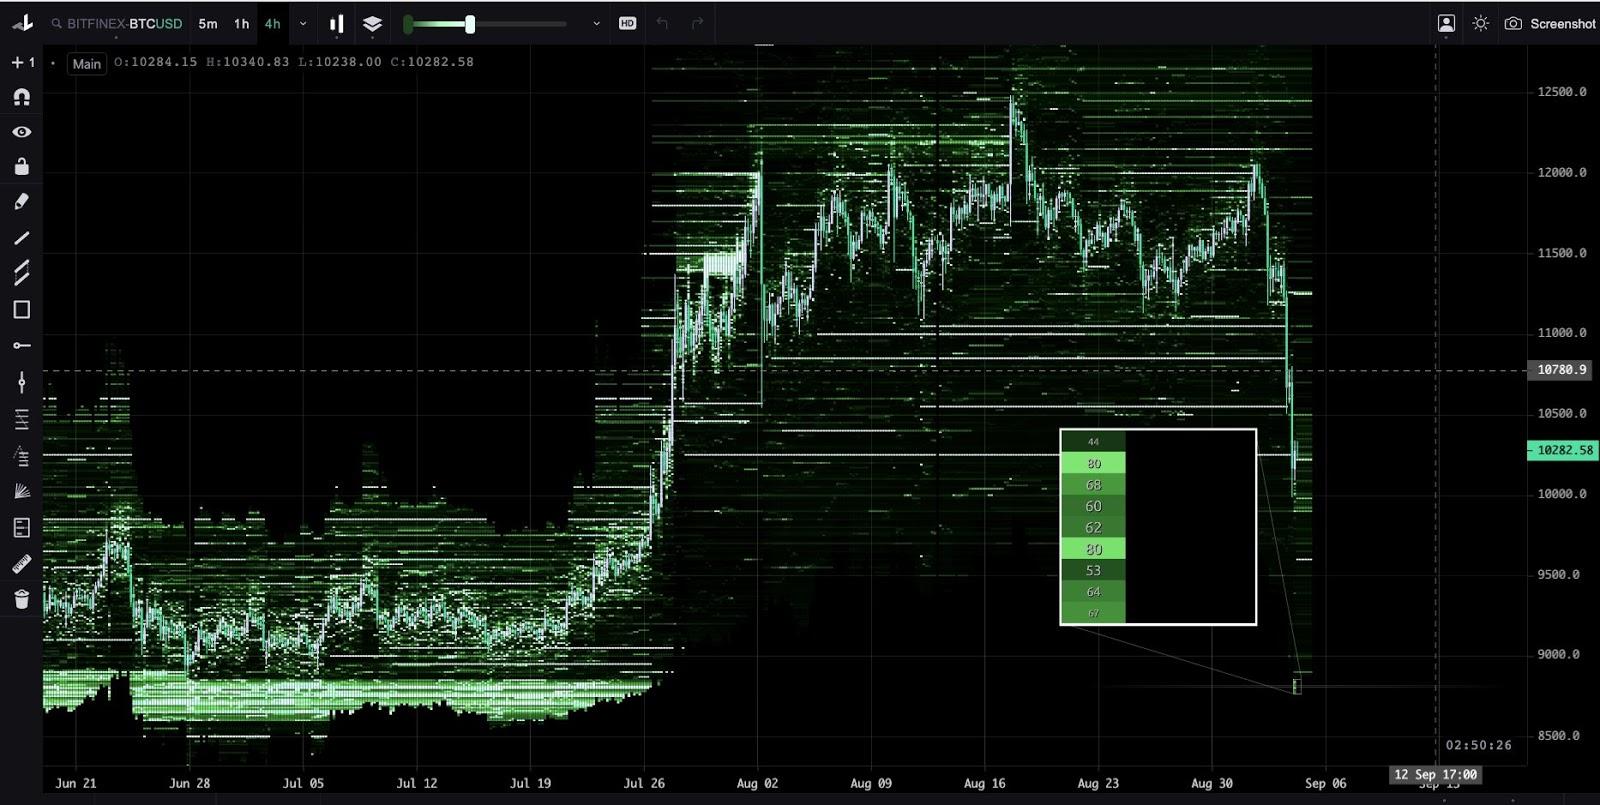 A massive Bitcoin buy order at $8,800 on Bitfinex